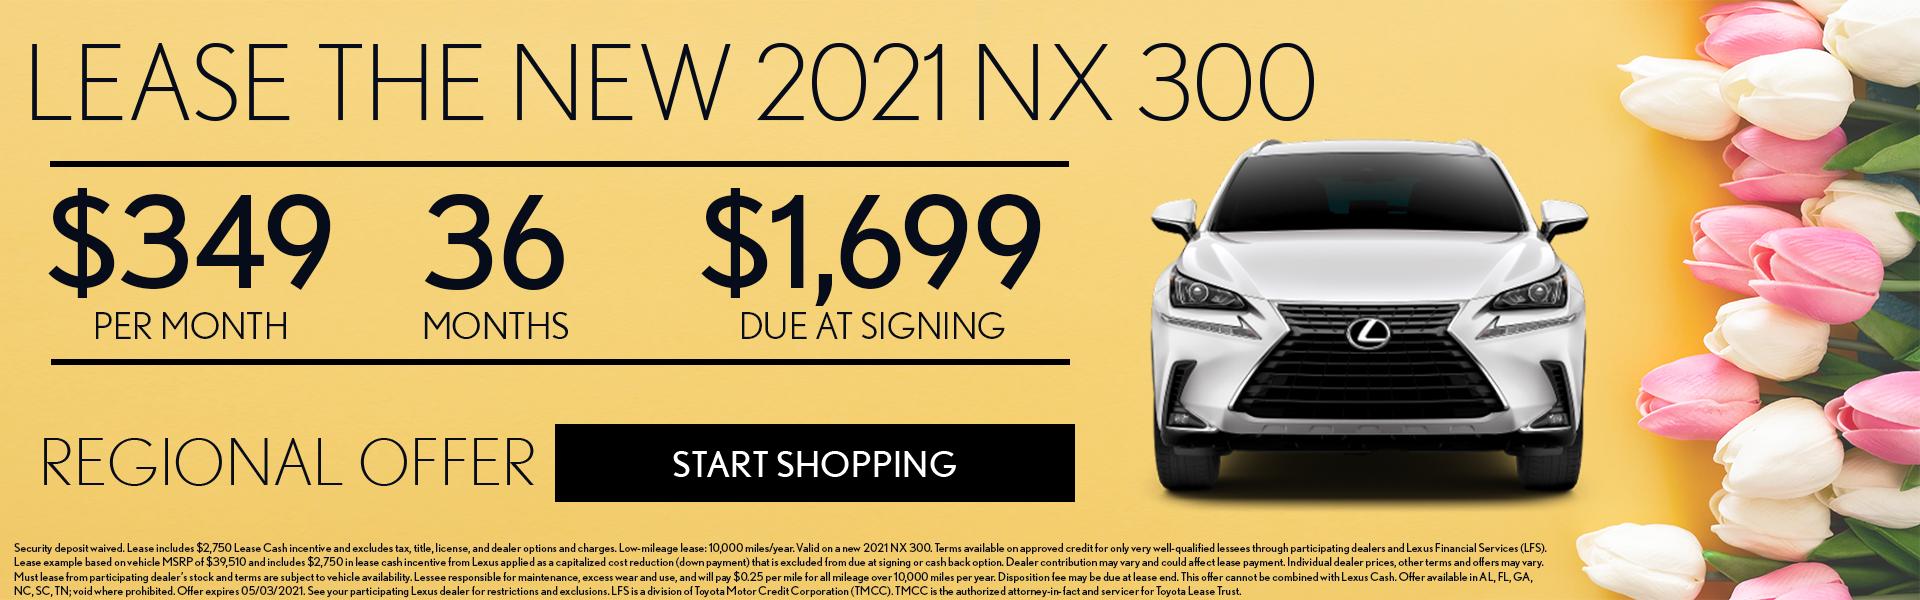 2021 NX 300 $349